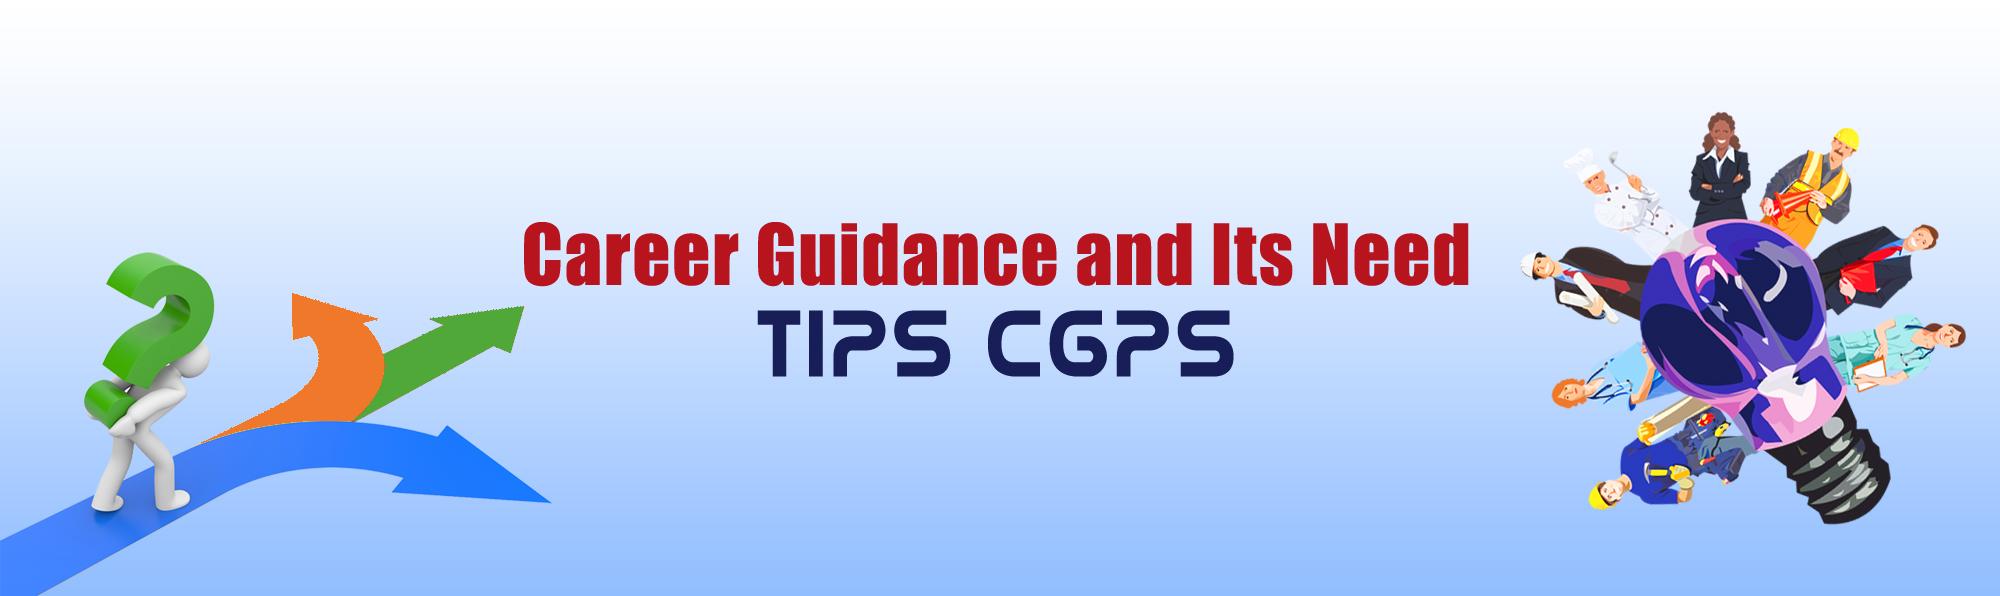 Career Guidance and Its Need TIPS CGPS